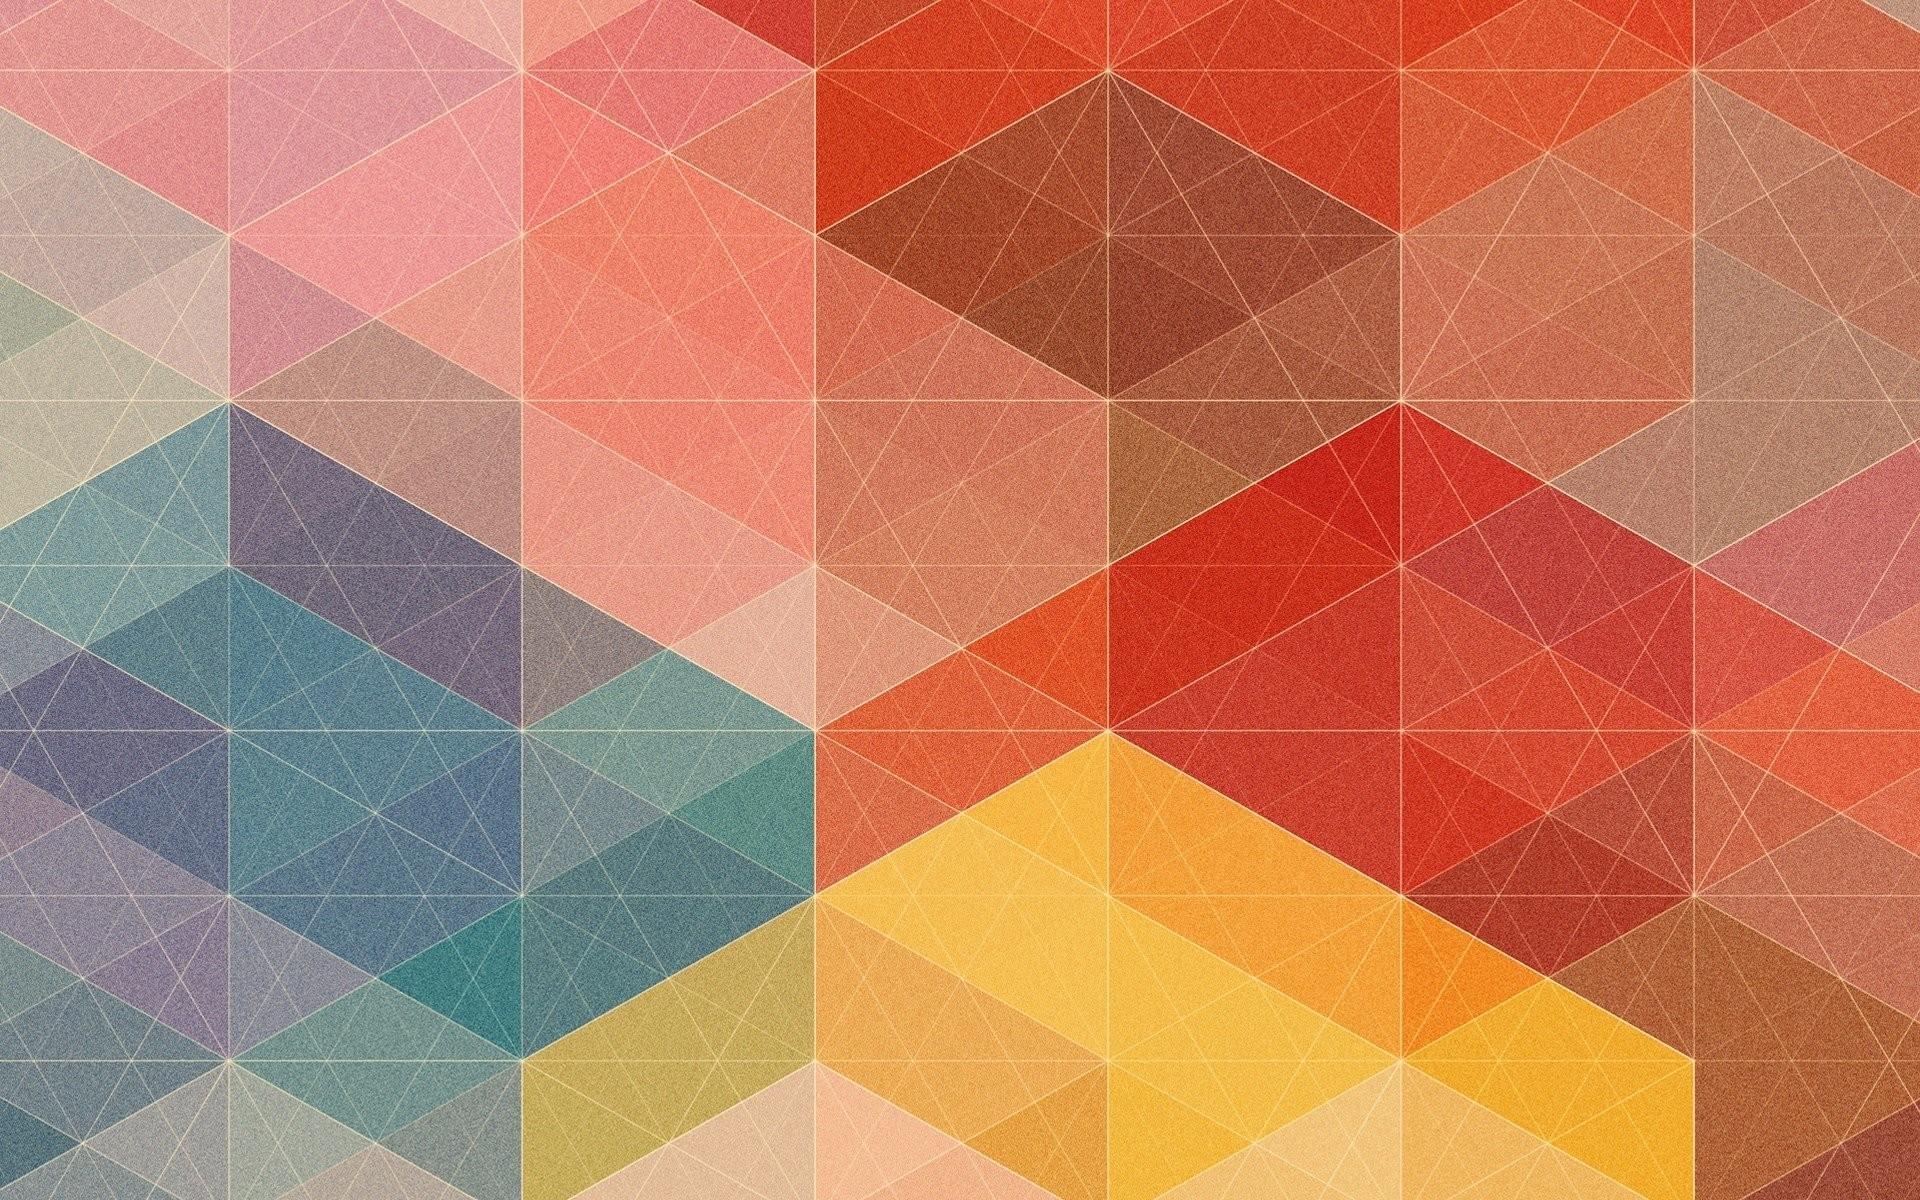 … geometric-shapes-design-wallpaper-3 Y370T